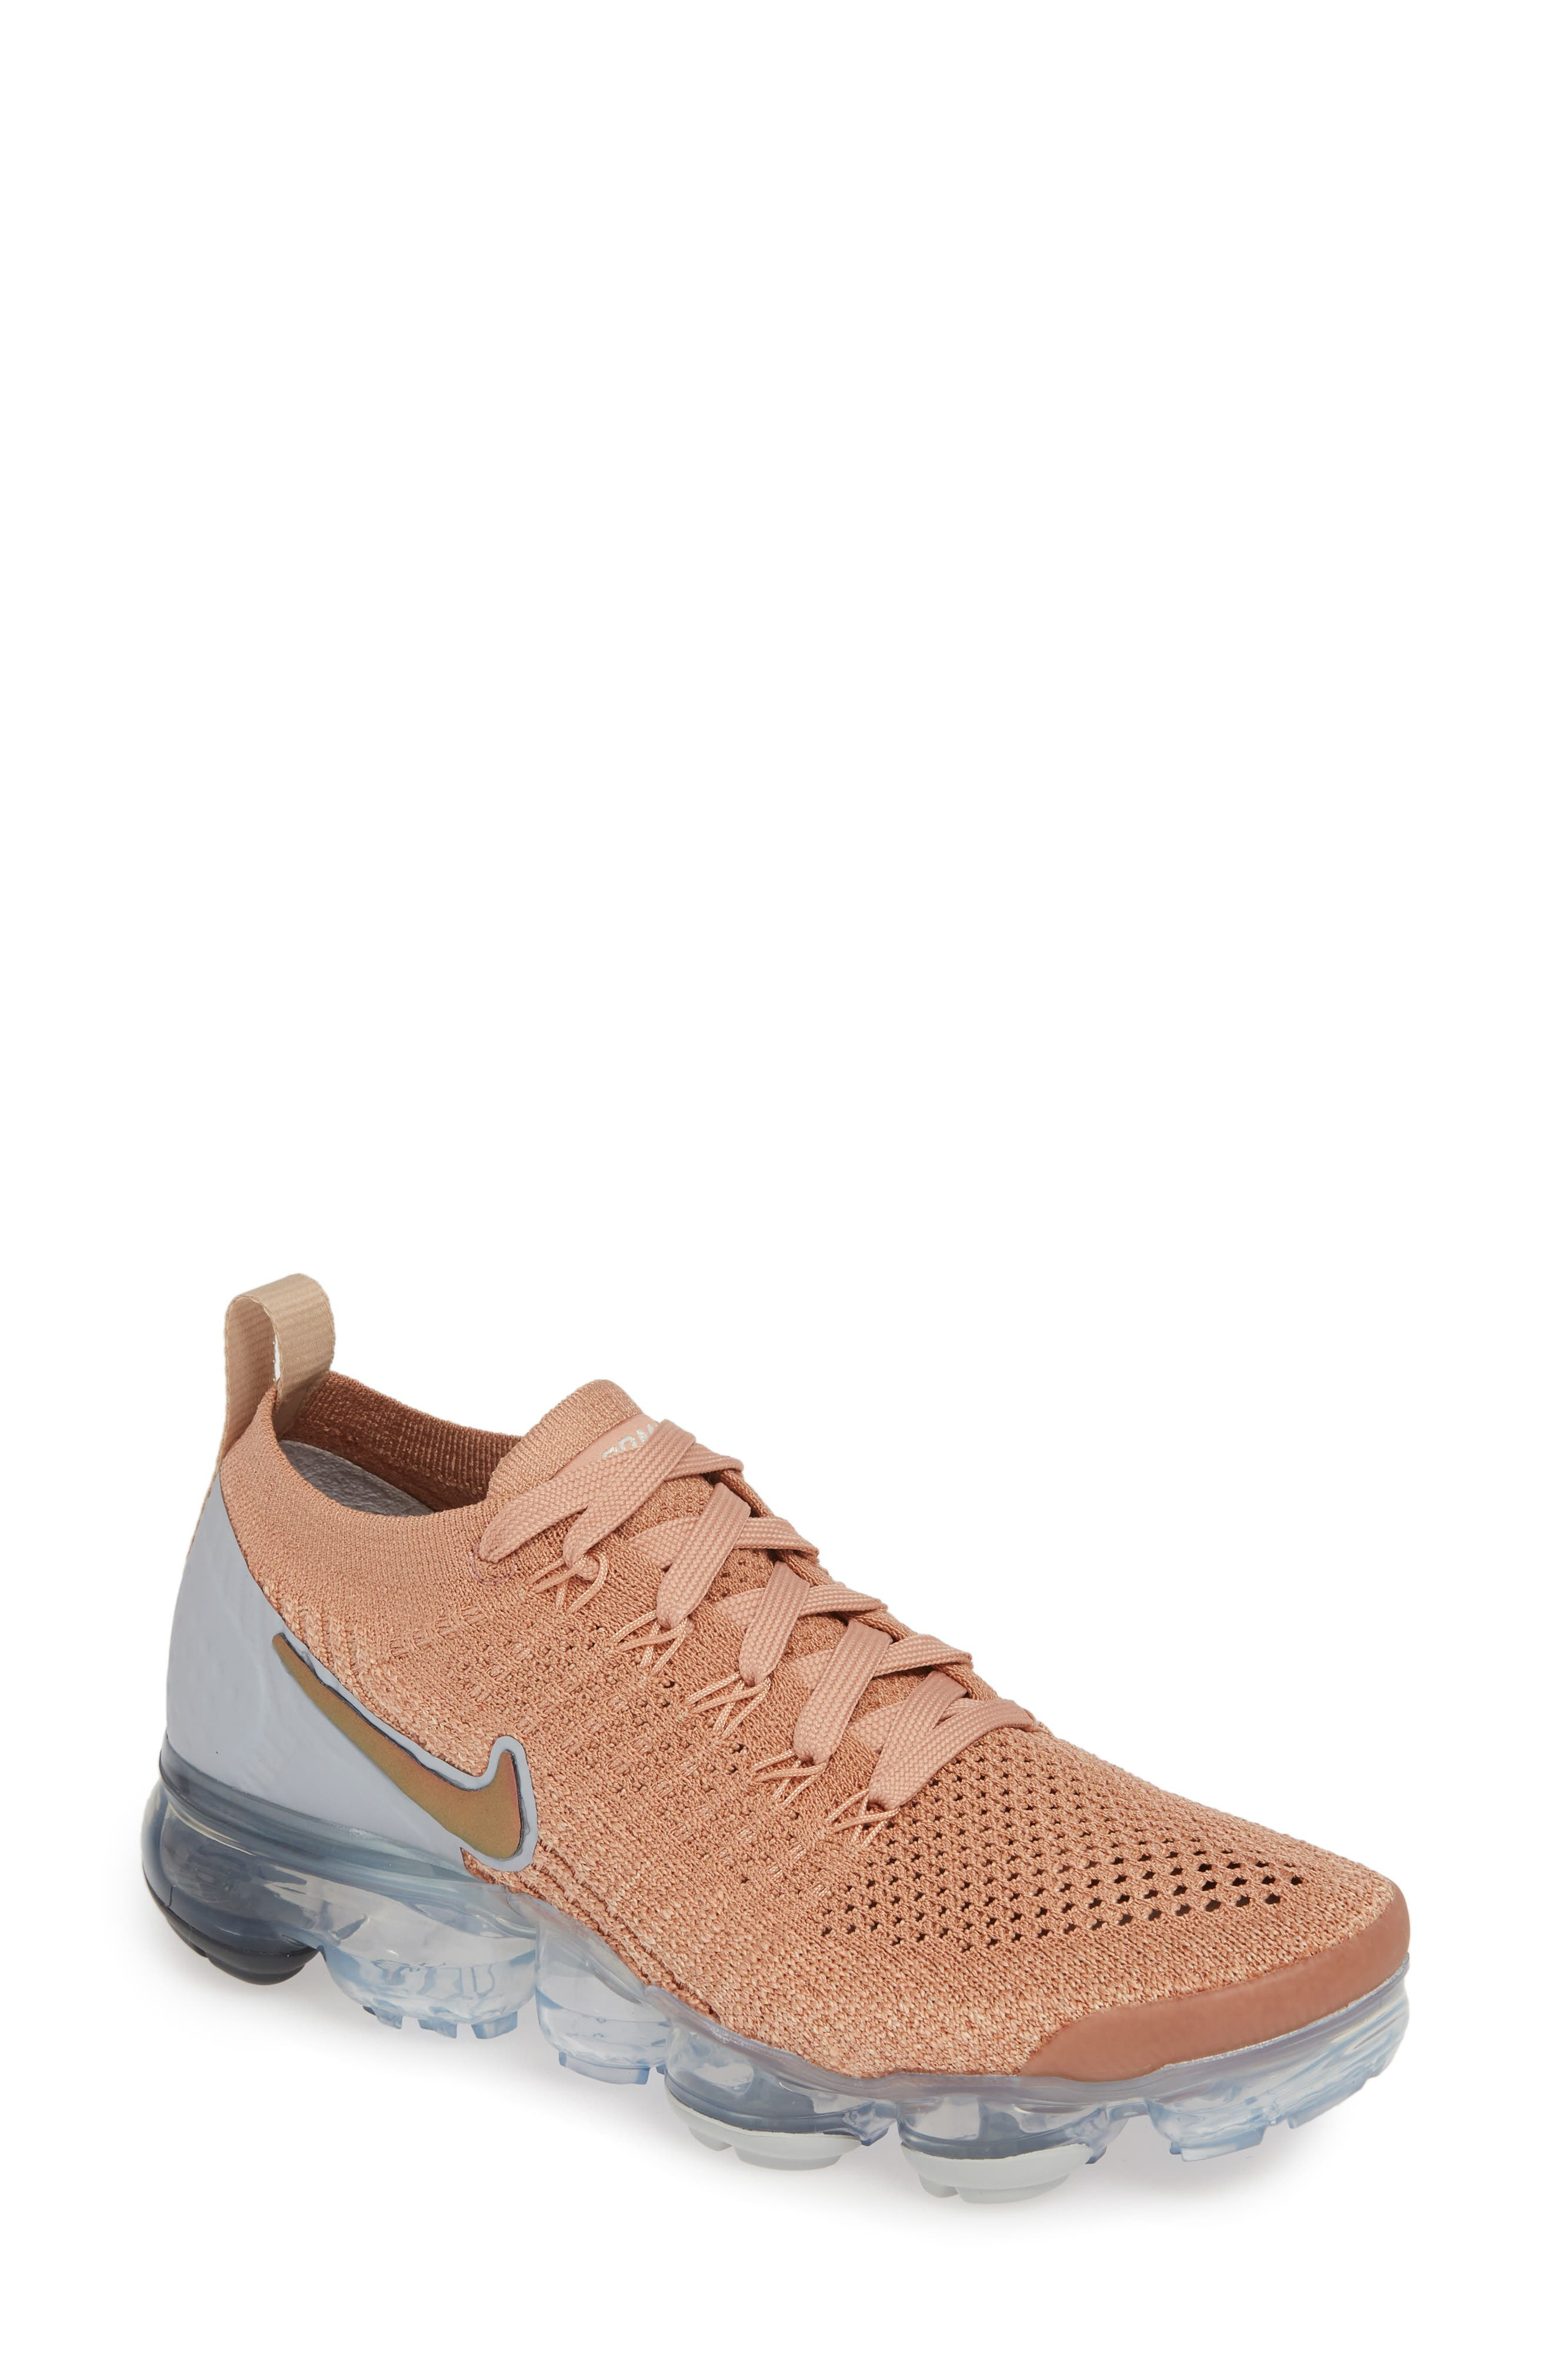 NIKE, Air VaporMax Flyknit 2 Running Shoe, Main thumbnail 1, color, ROSE GOLD/ BIO BEIGE